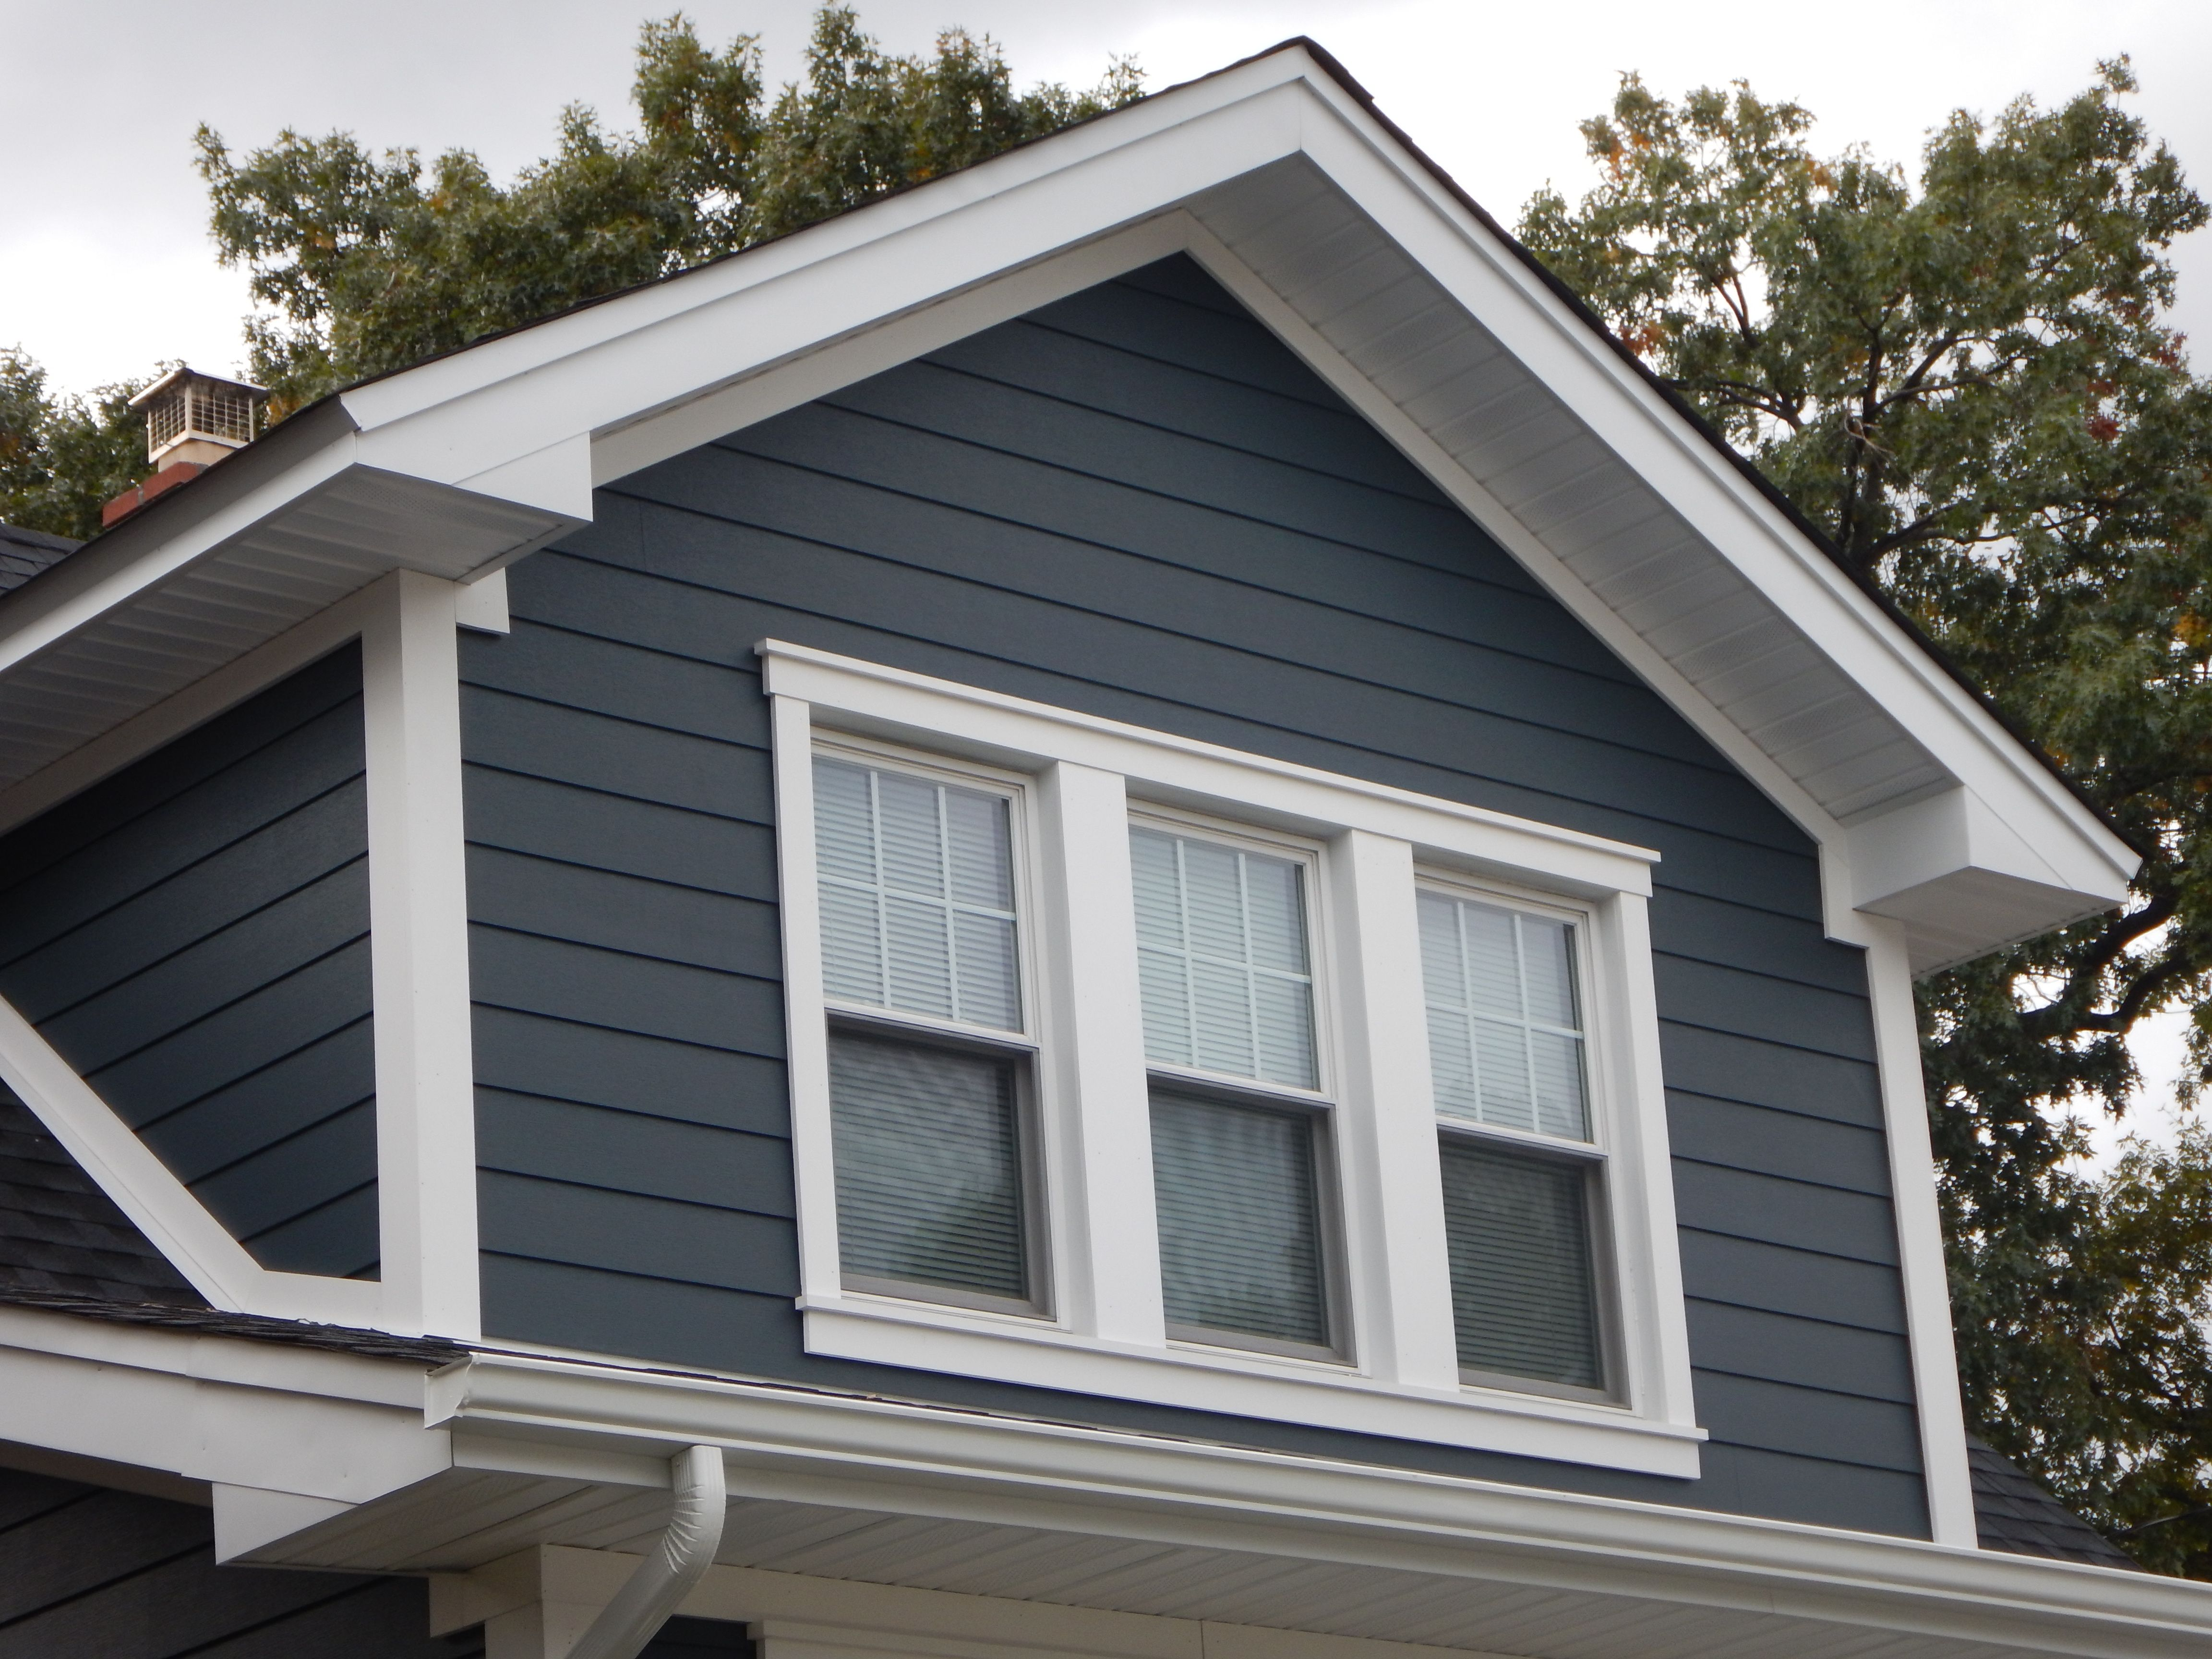 Find A Siding Contractor Passaic Local Sider Passaic Siding Replacement Passaic Modernhomes Free Est Window Trim Exterior Windows Exterior Outdoor Window Trim